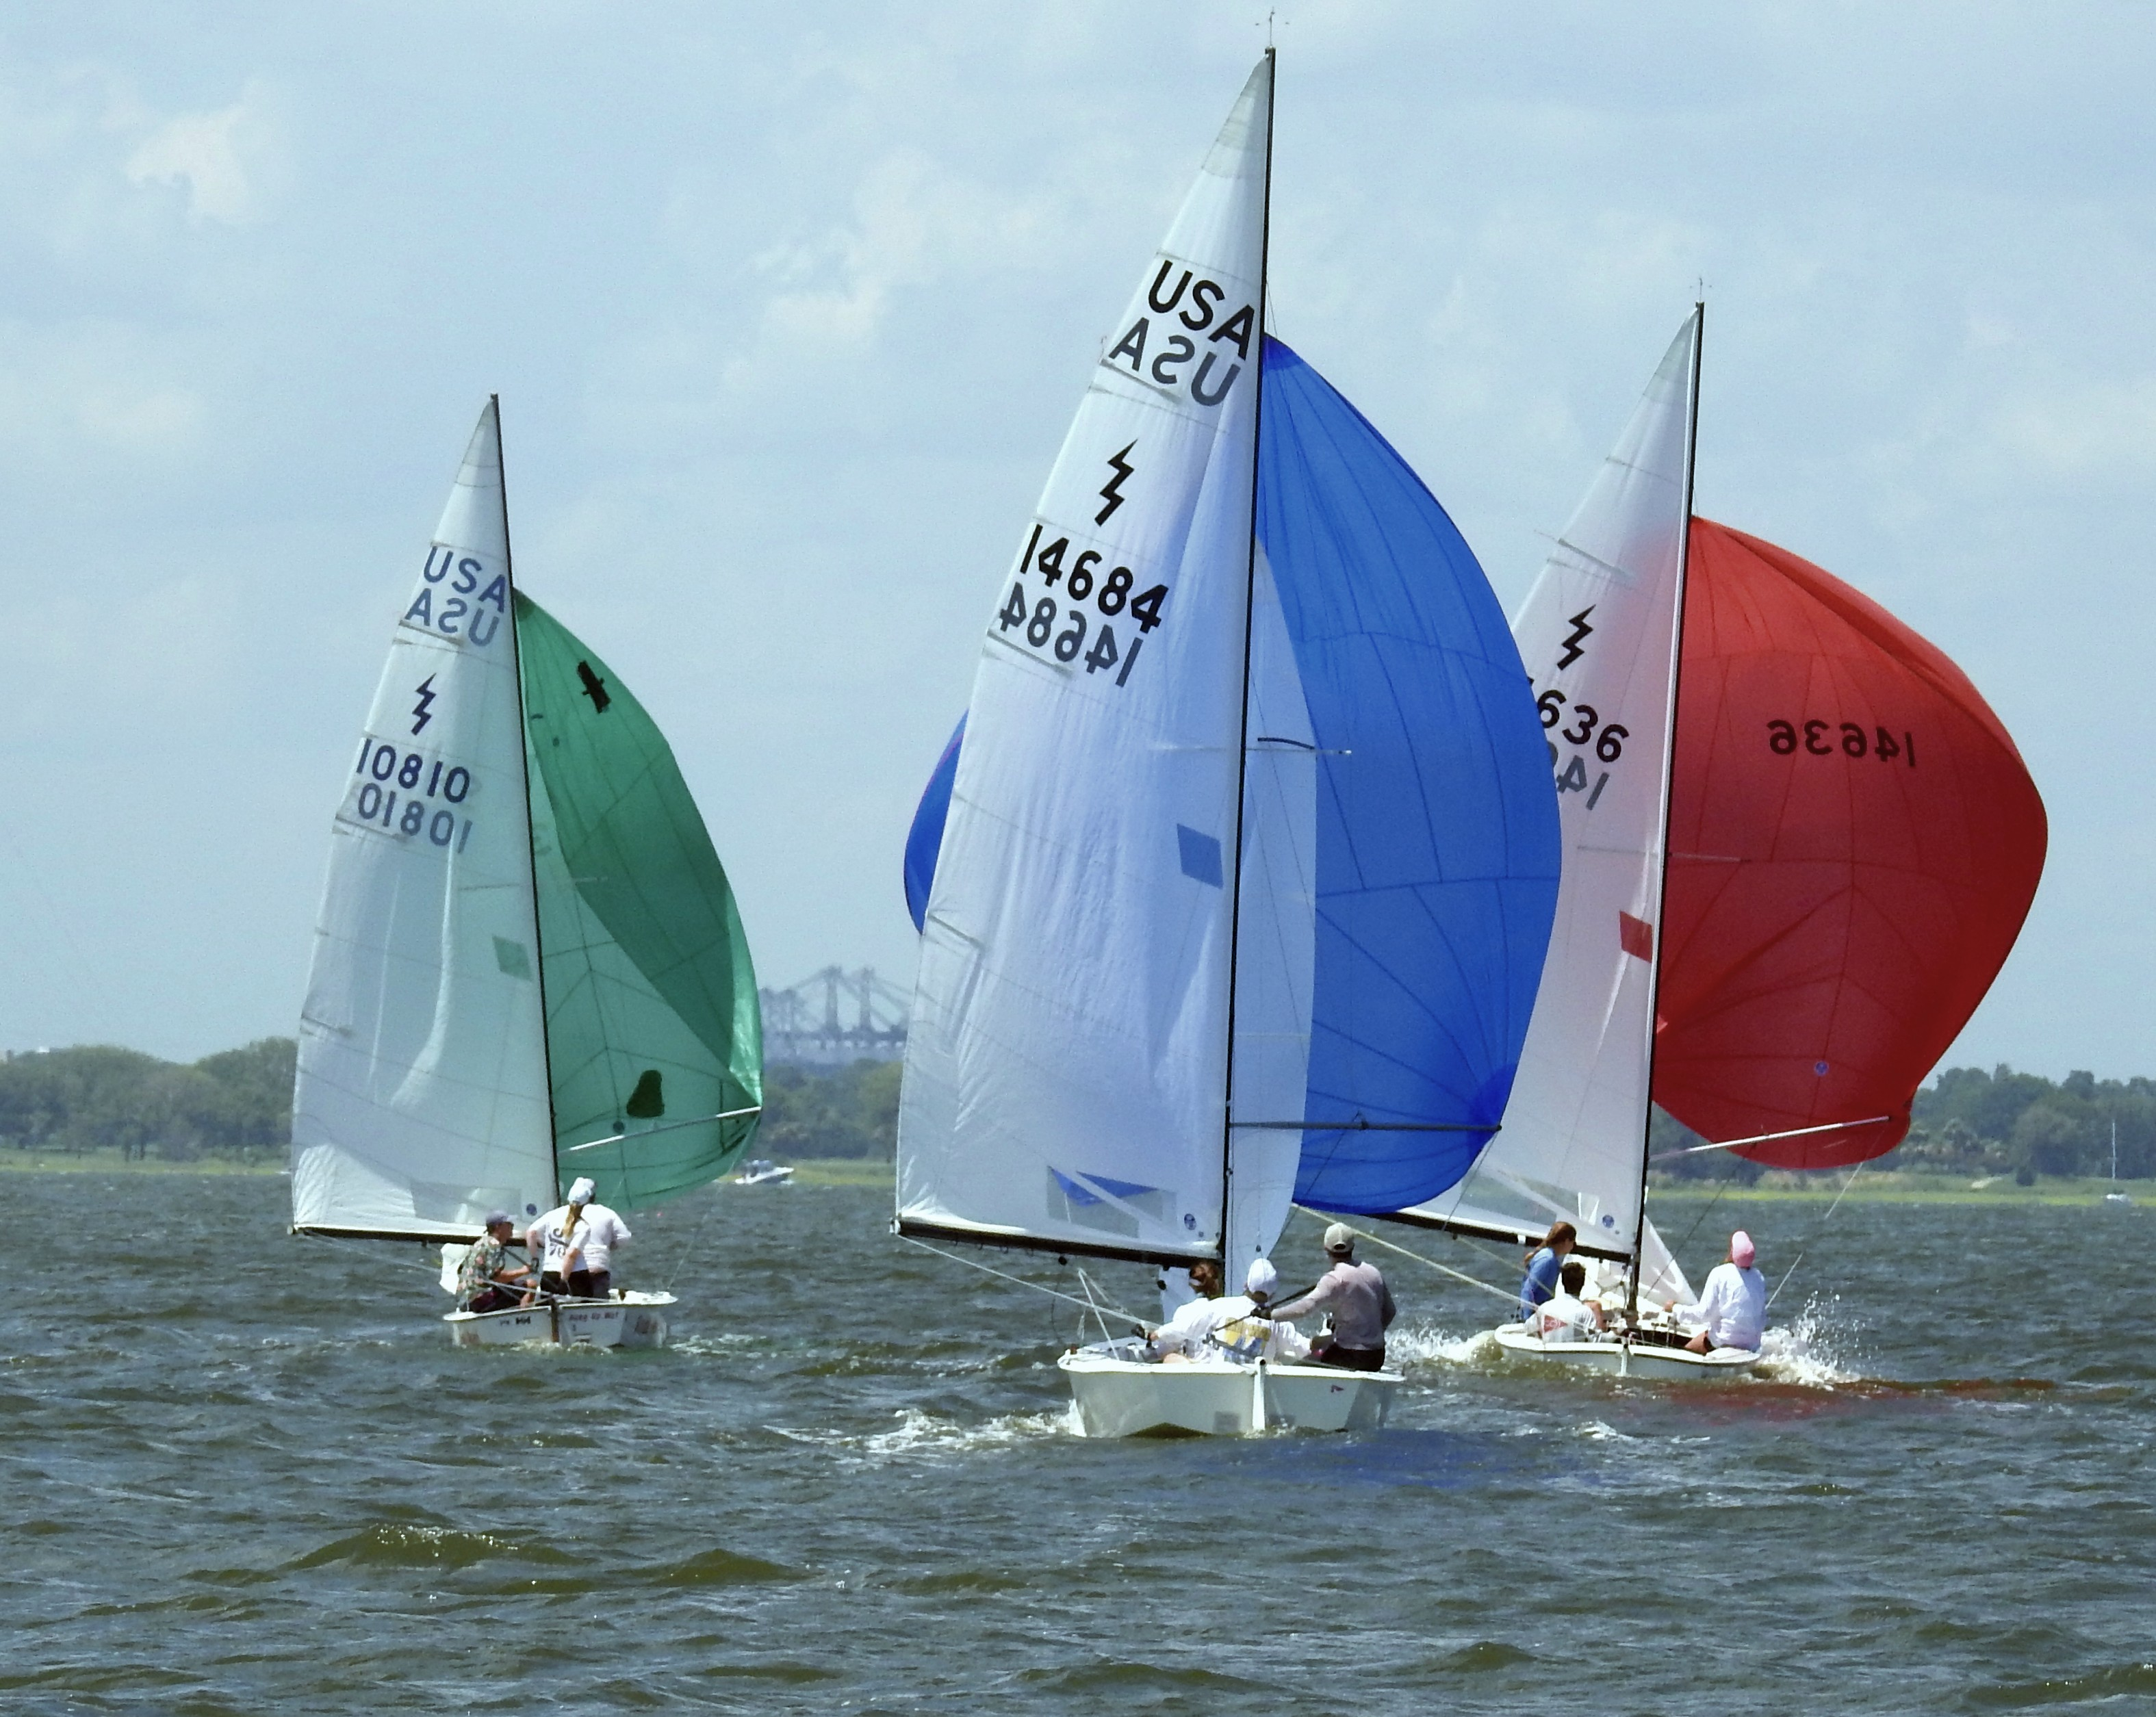 On the Charleston Harbor sailing